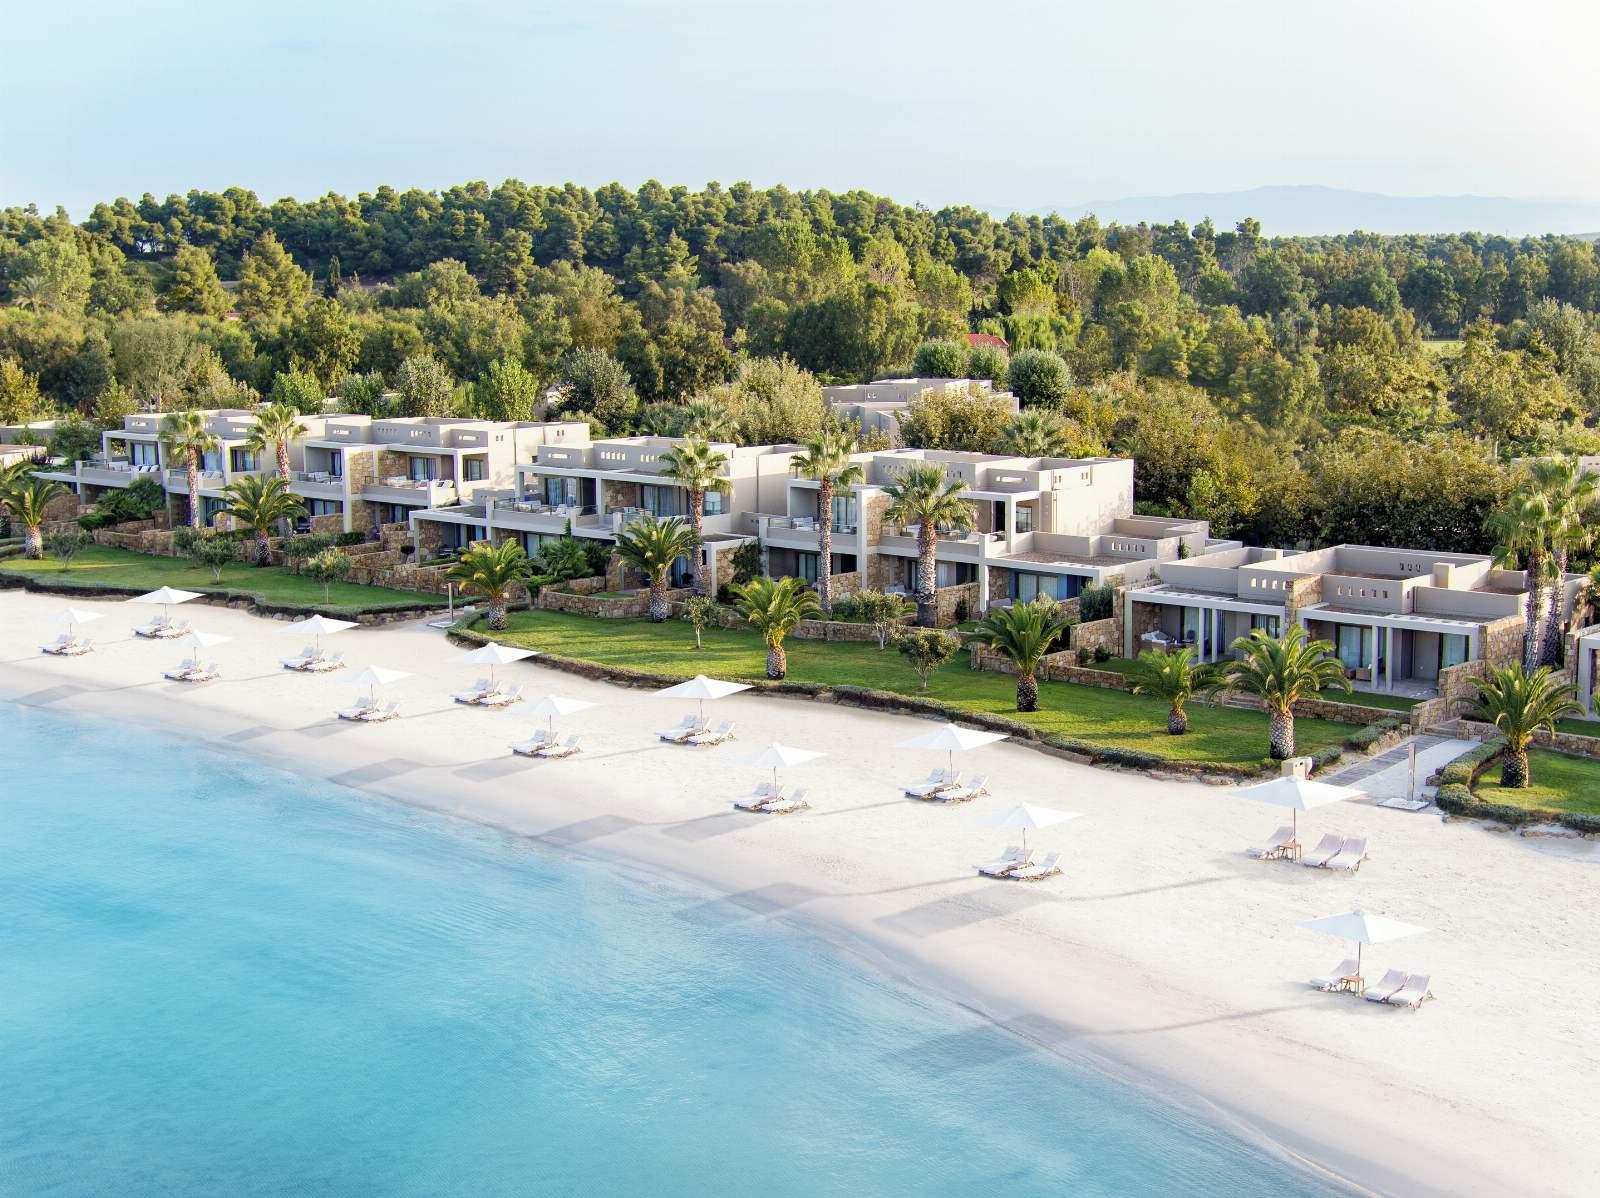 Sani Resort - Sani Asterias Beach Front